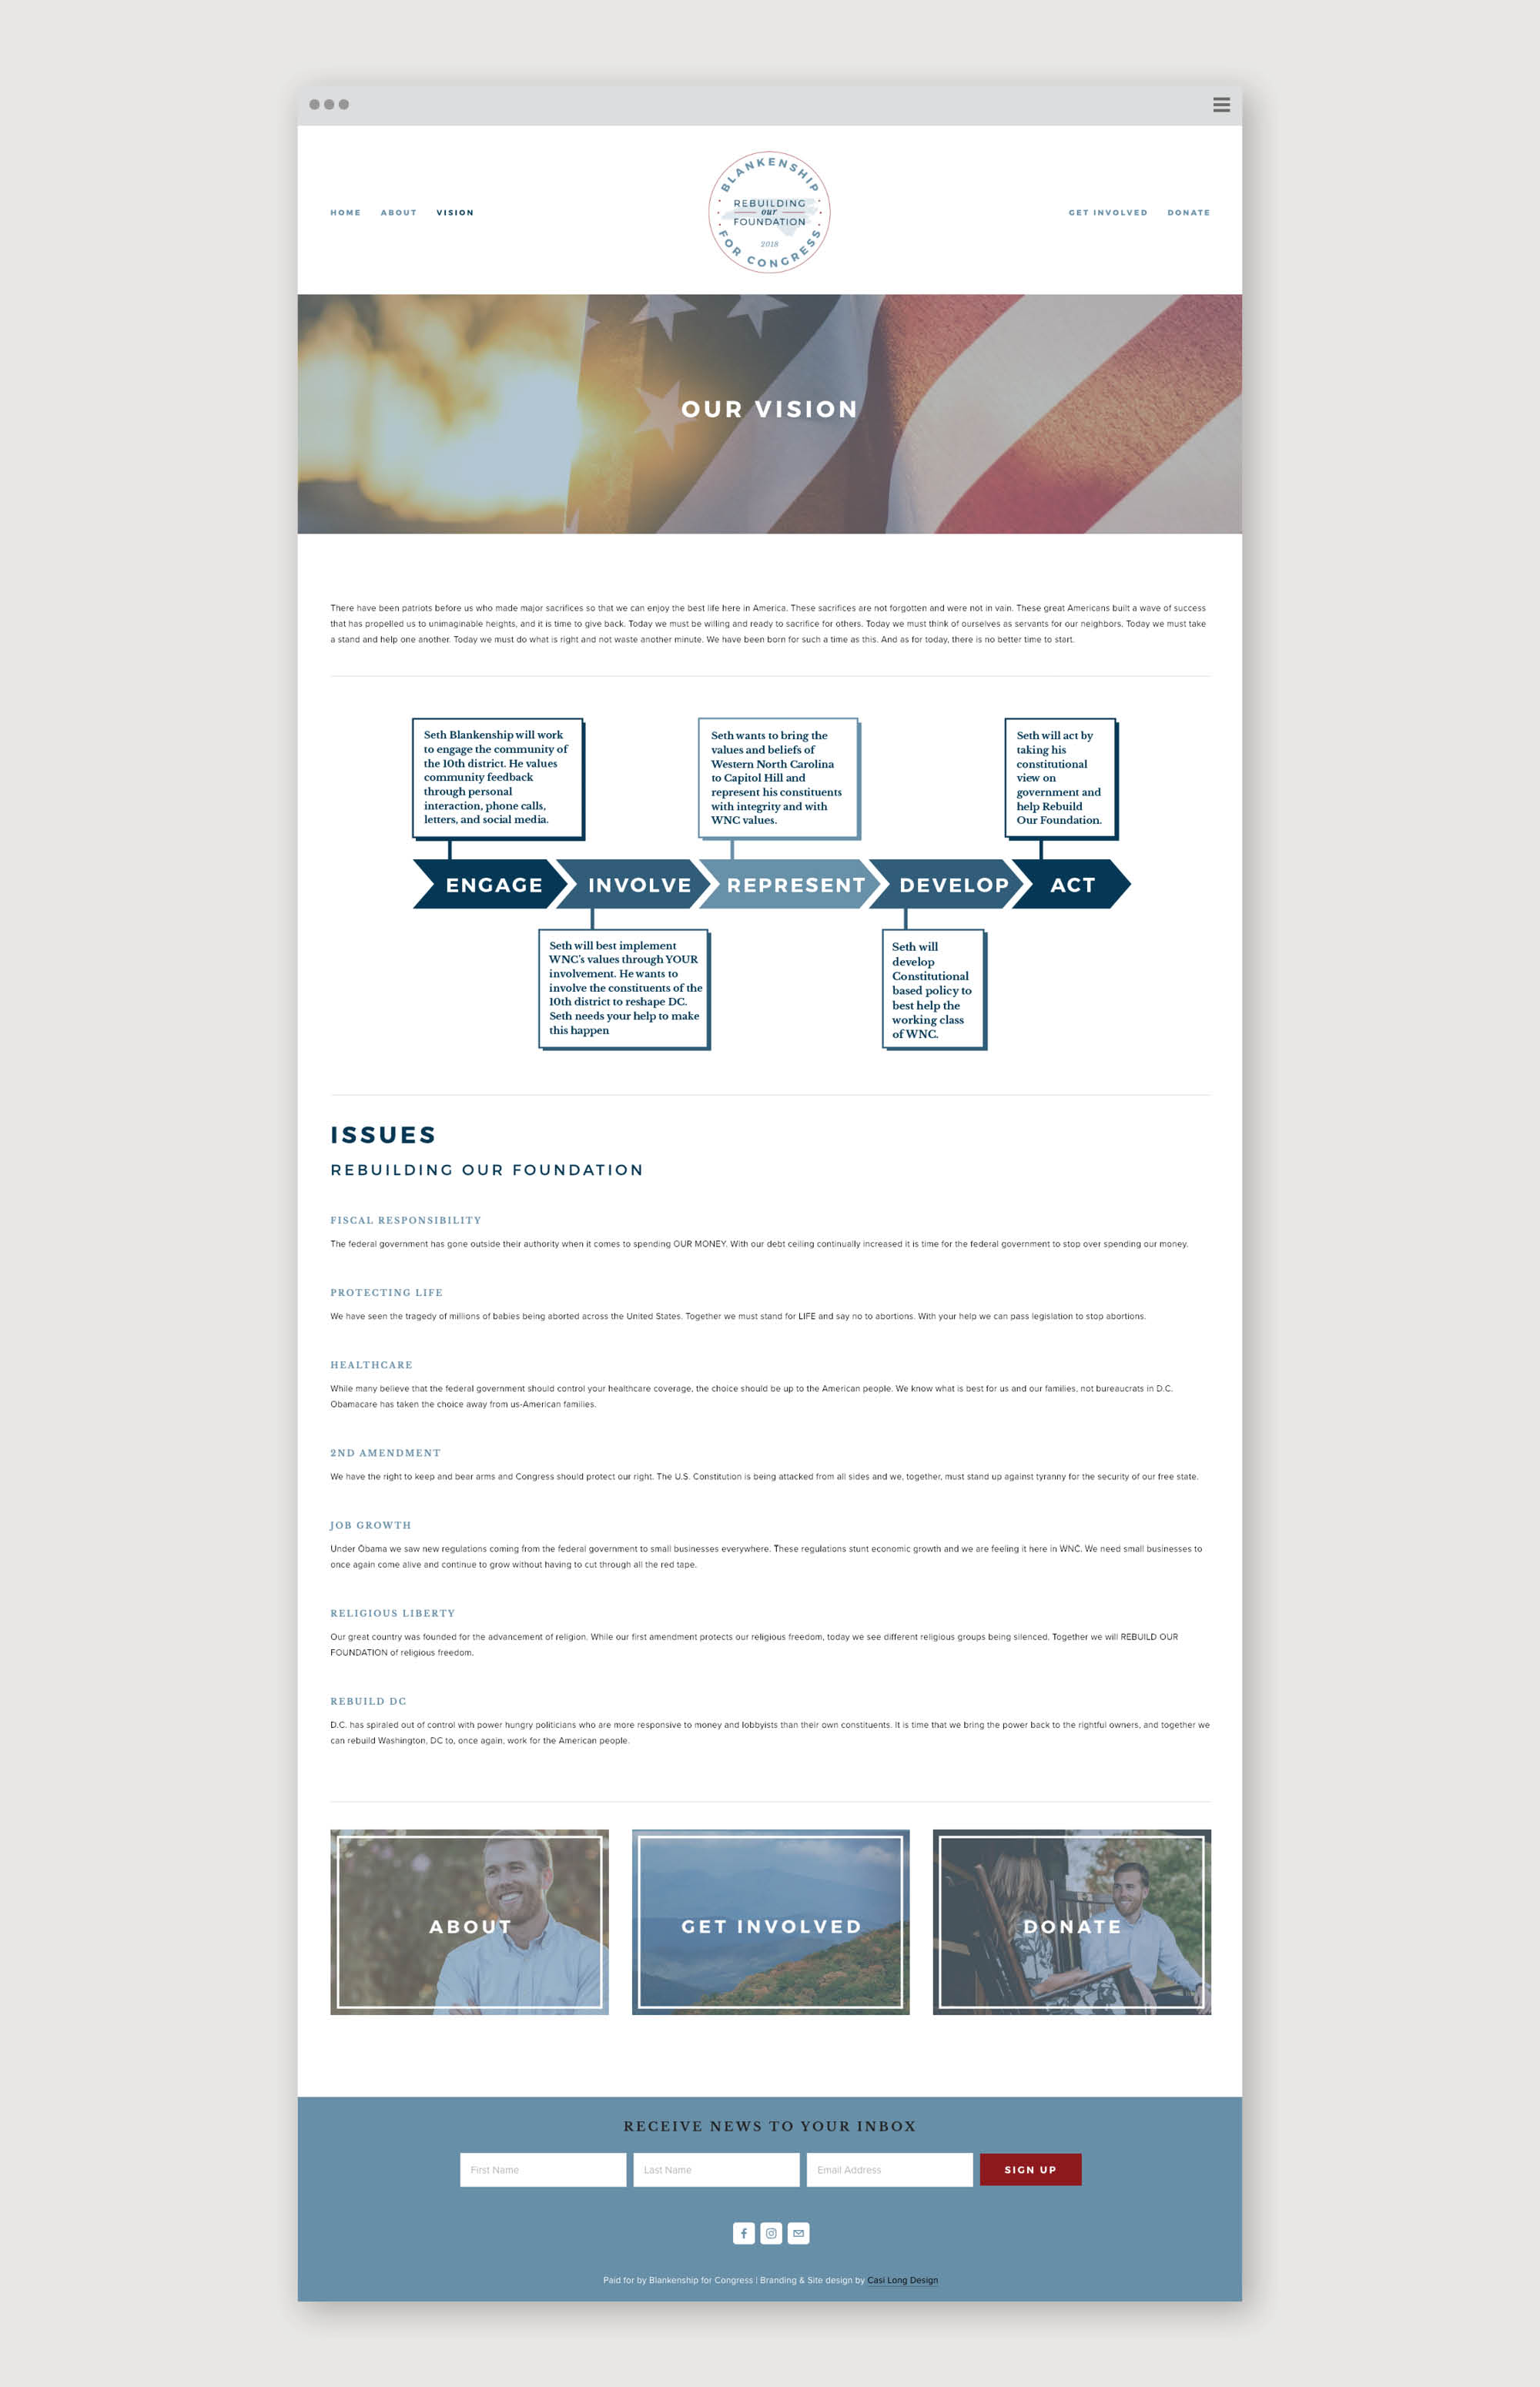 Blankenship for Congress | Website by Casi Long Design | casilong.com